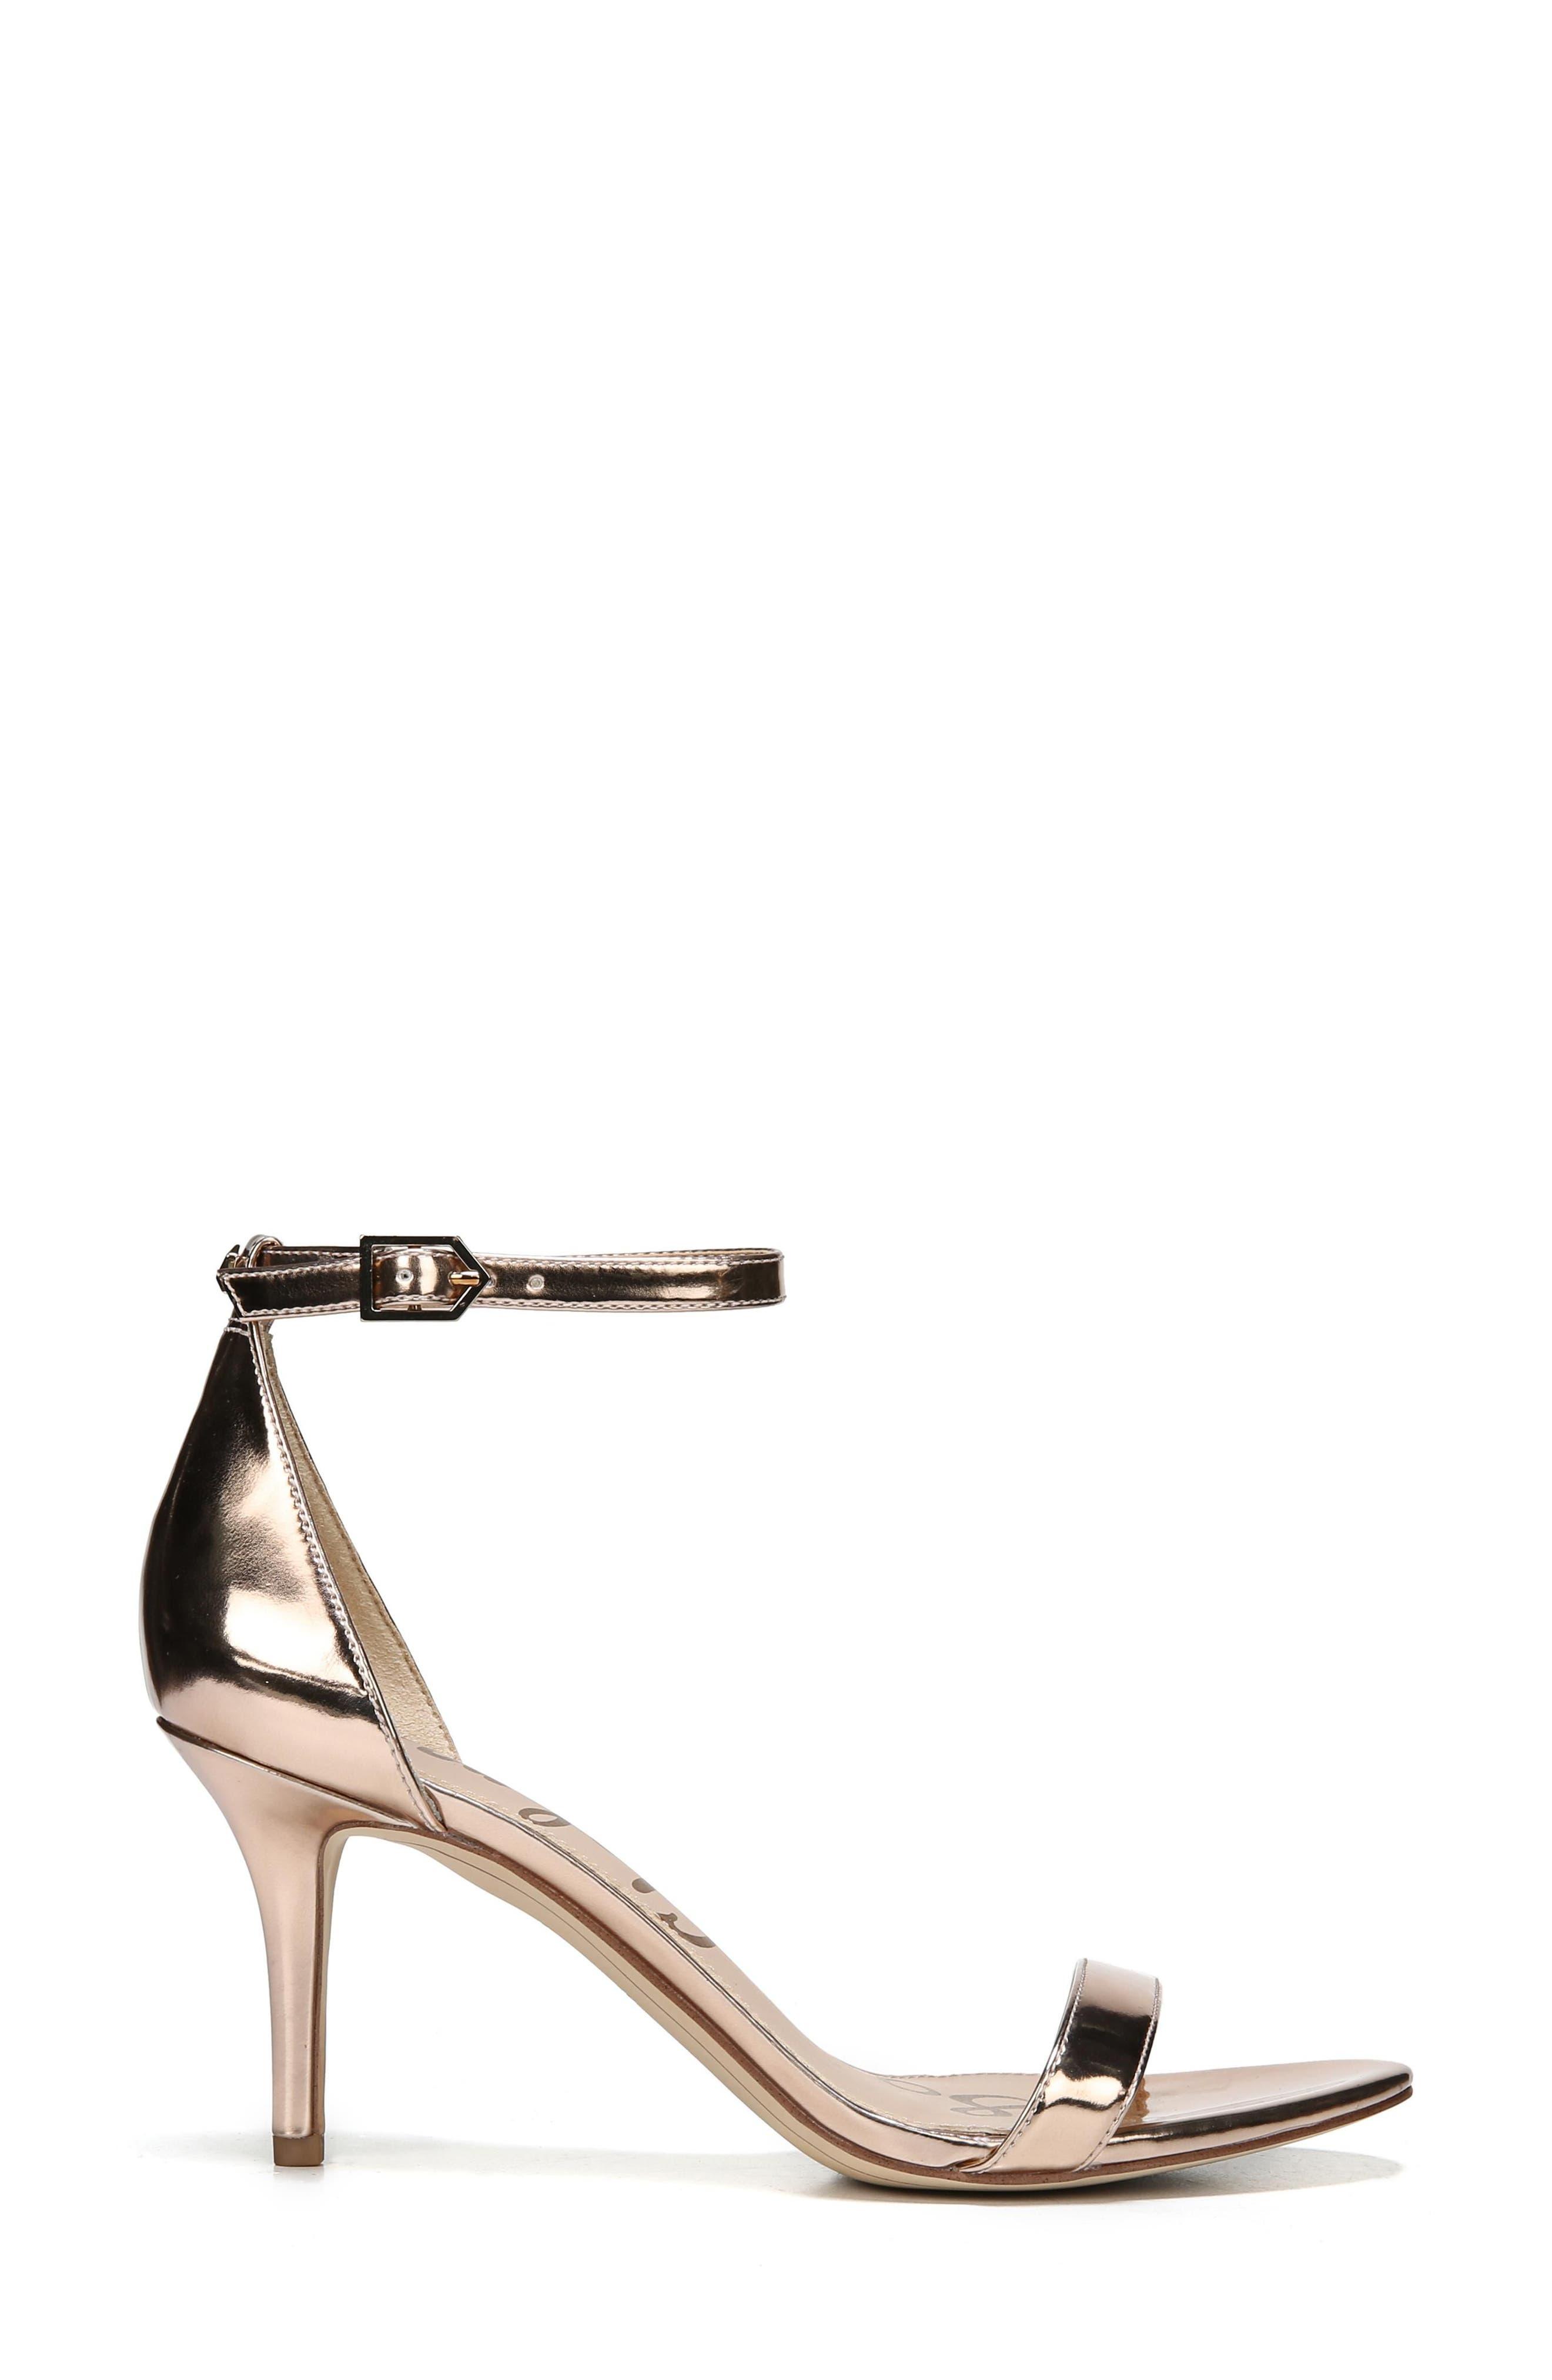 ,                             'Patti' Ankle Strap Sandal,                             Alternate thumbnail 124, color,                             650